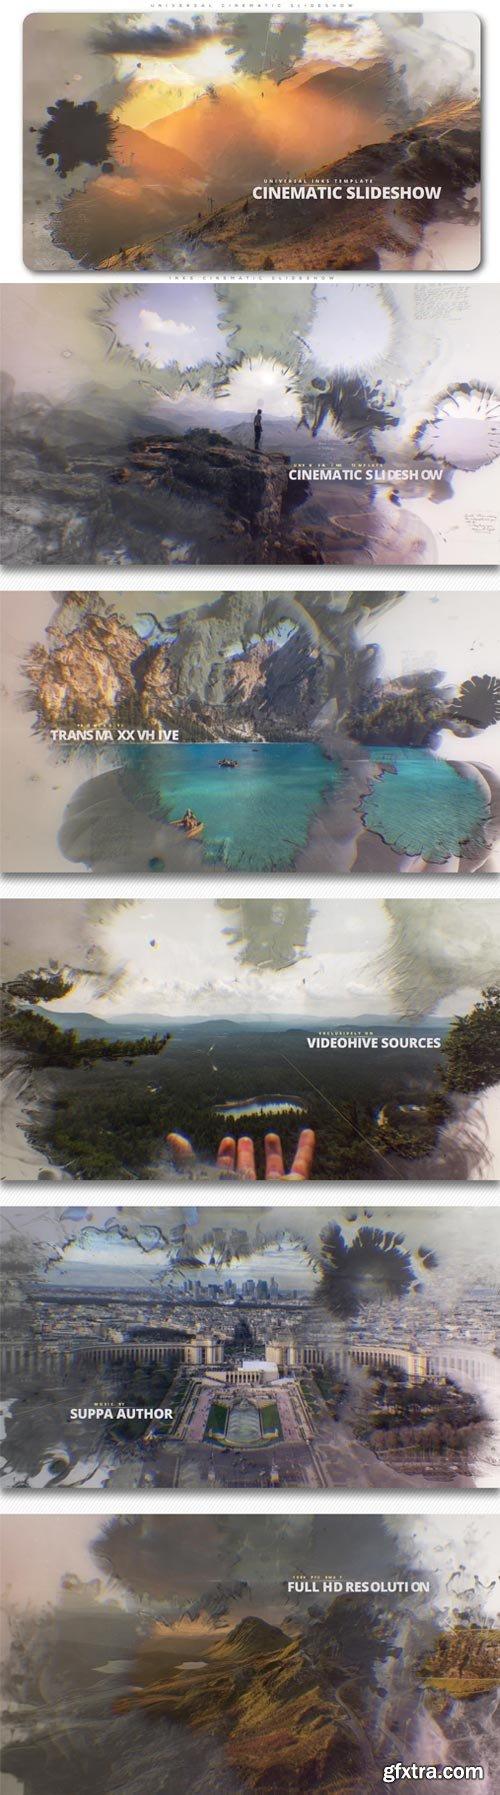 Videohive - Inks Cinematic Slideshow - 22323501